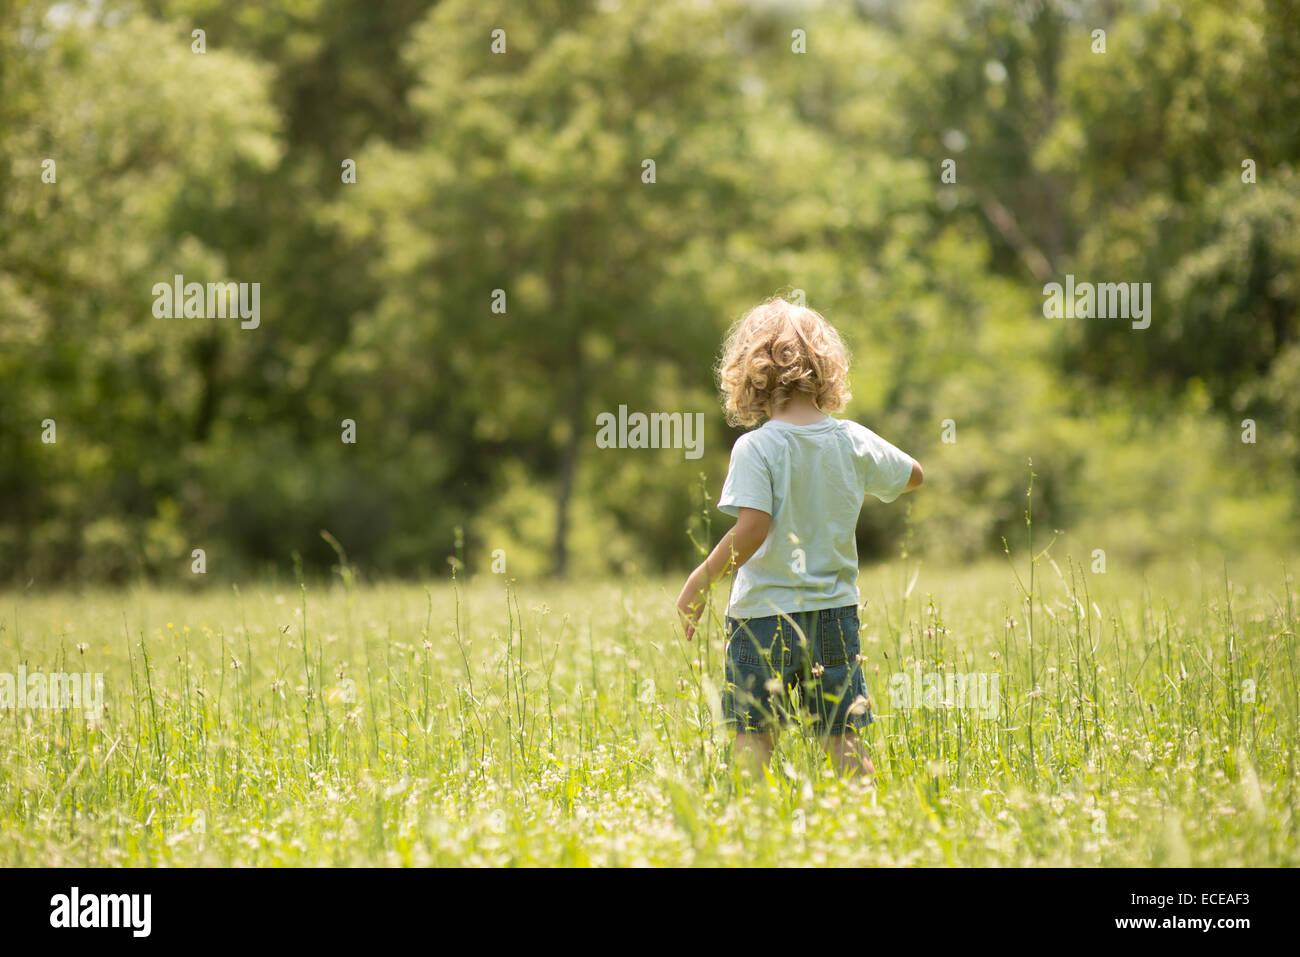 USA, South Carolina, Greenville County, Greenville, Boy (2-3) in green grass - Stock Image